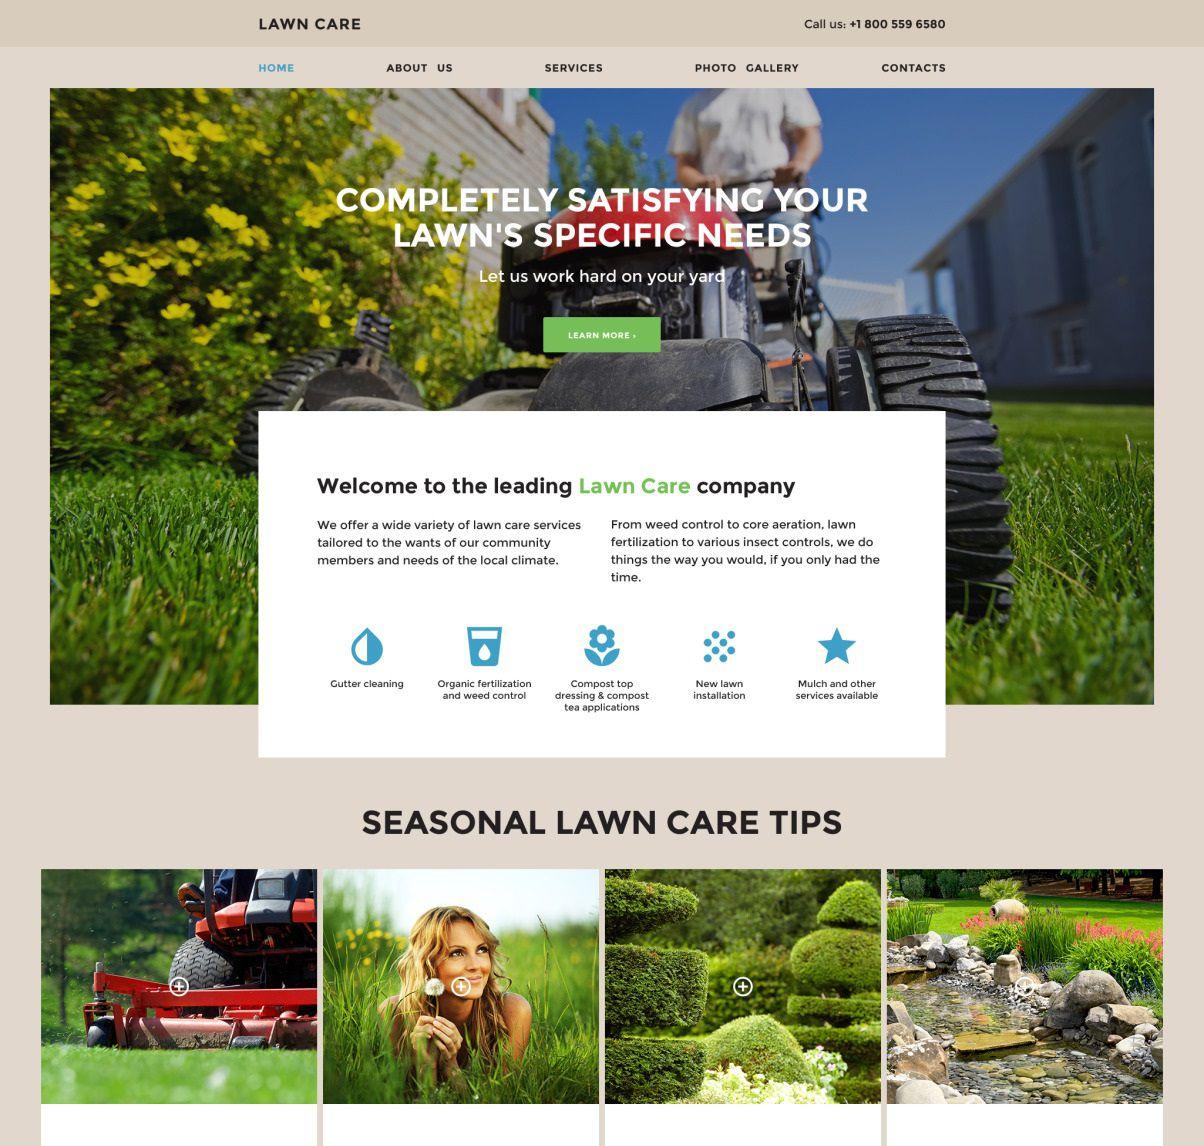 008 Unusual Lawn Care Website Template Sample Full